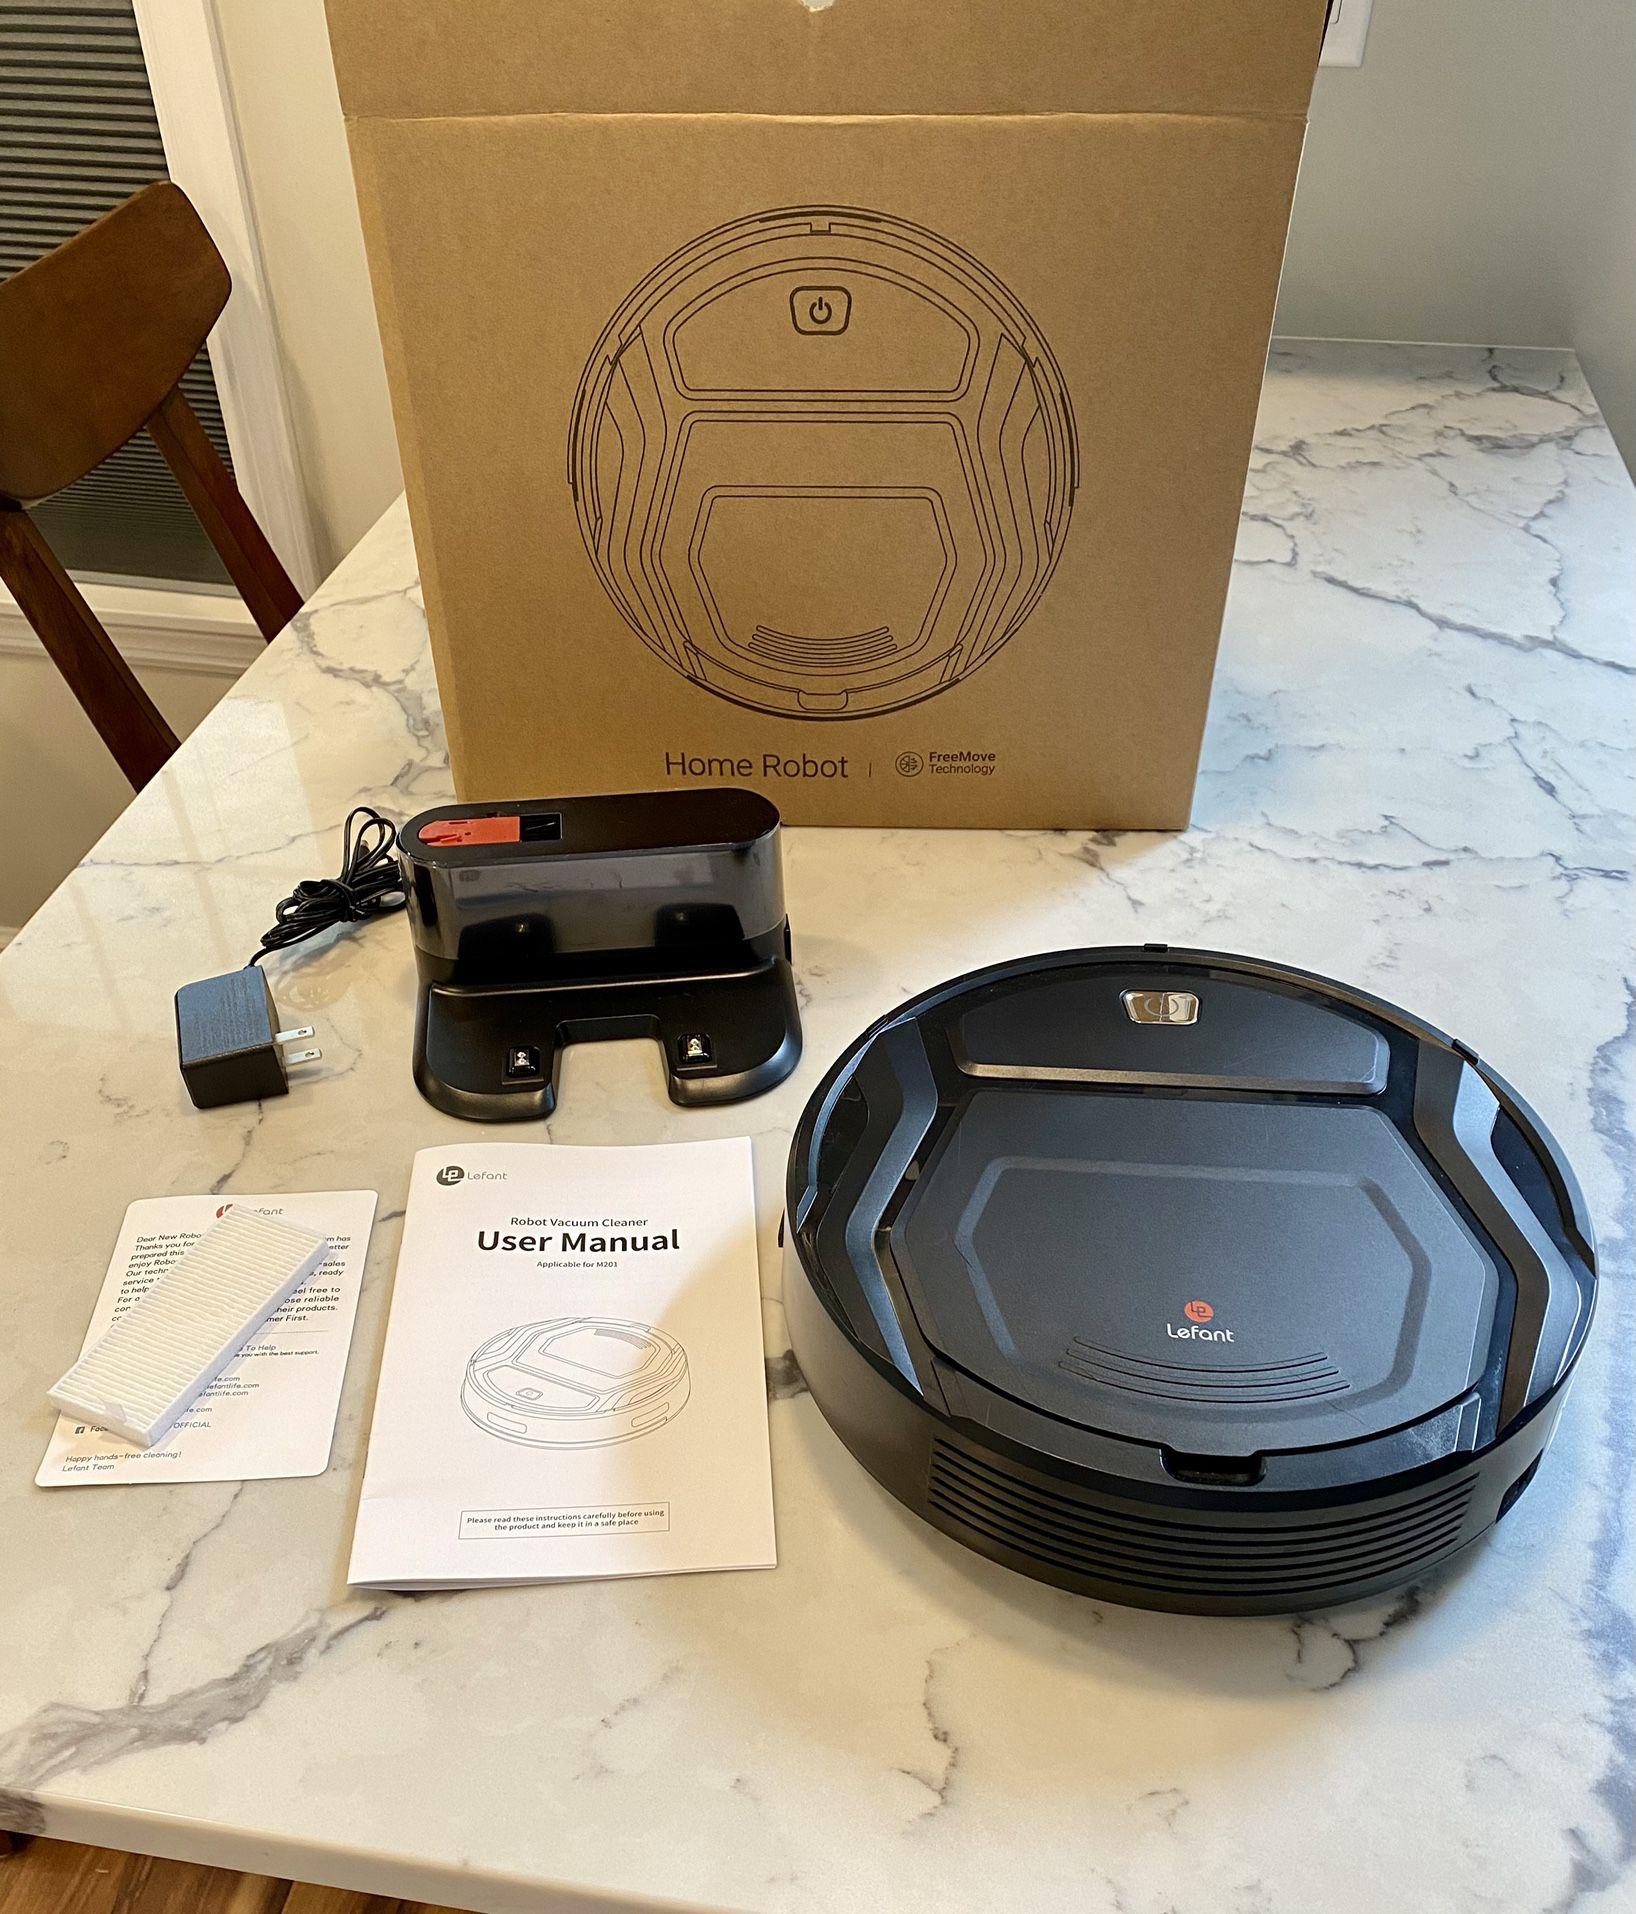 Lefant Robot Vacuum Cleaner, Auto Robotic Vacuums, Upgraded 6D Collision Sensor, 1800pa WiFi/App/Alexa, Self-Charging, Super Quiet Mini Cleaning Robot